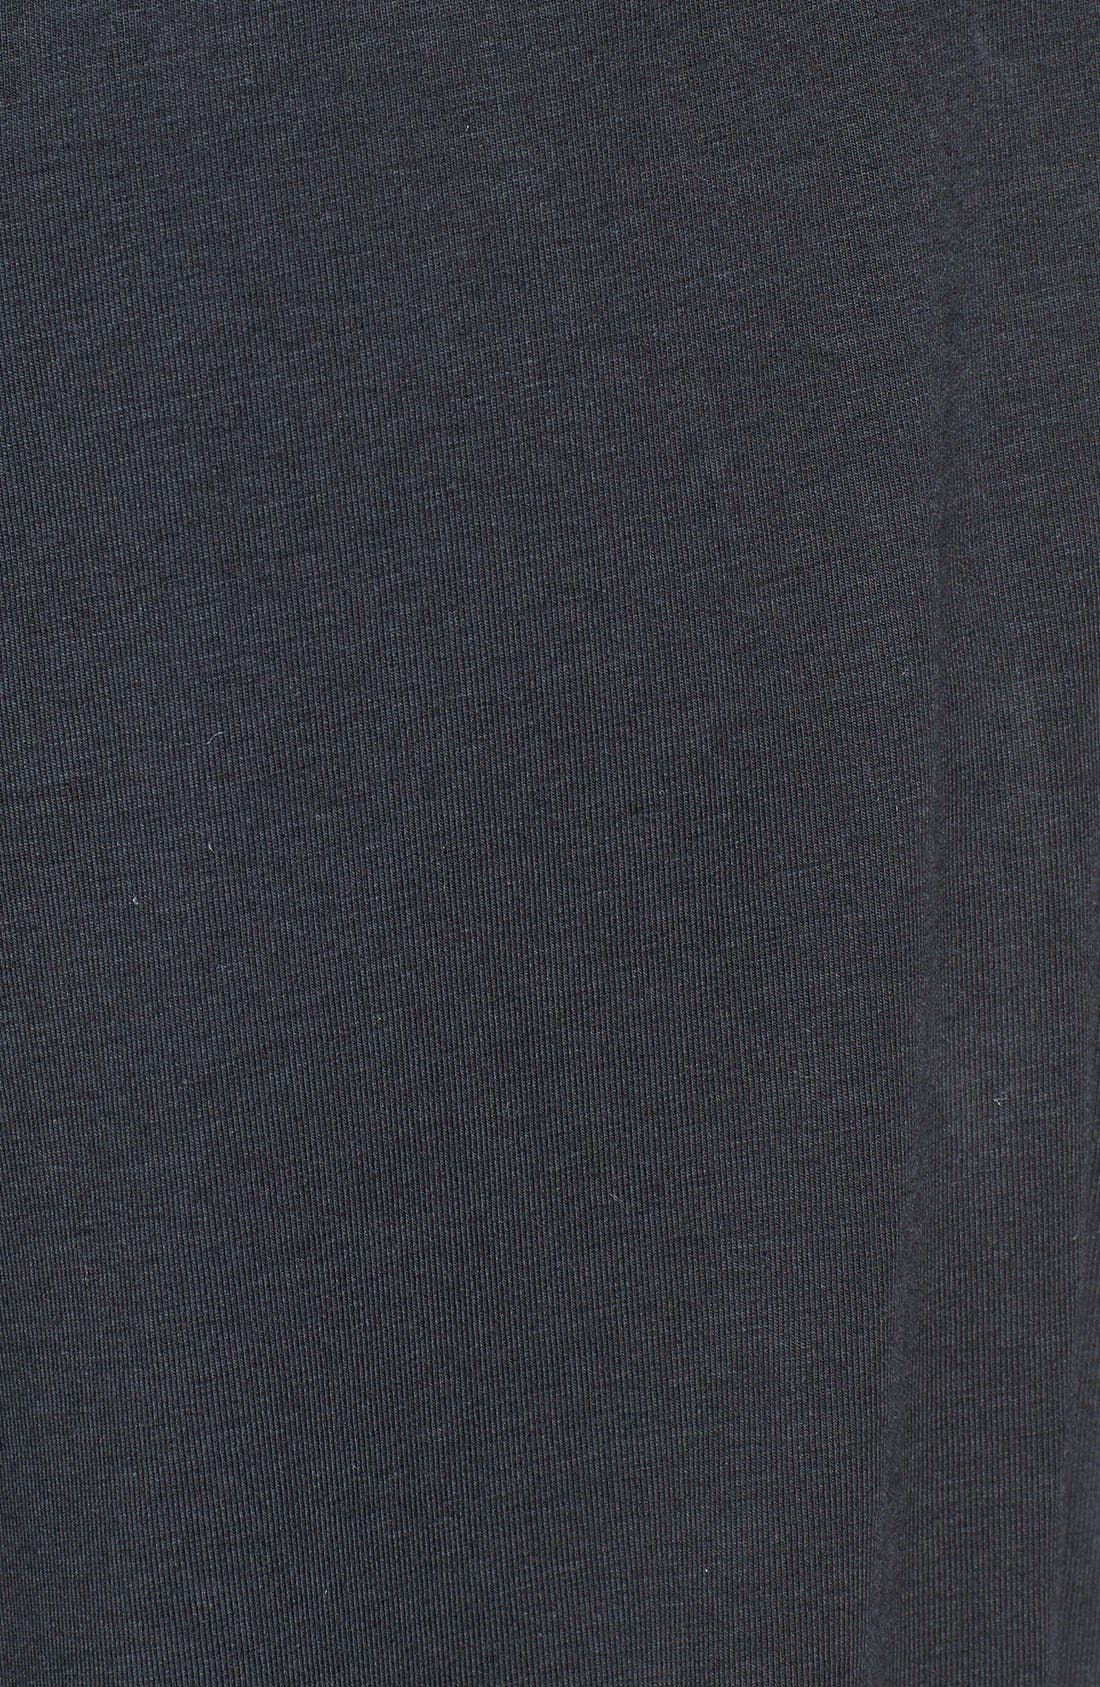 'Supta' Jumpsuit,                             Alternate thumbnail 2, color,                             001